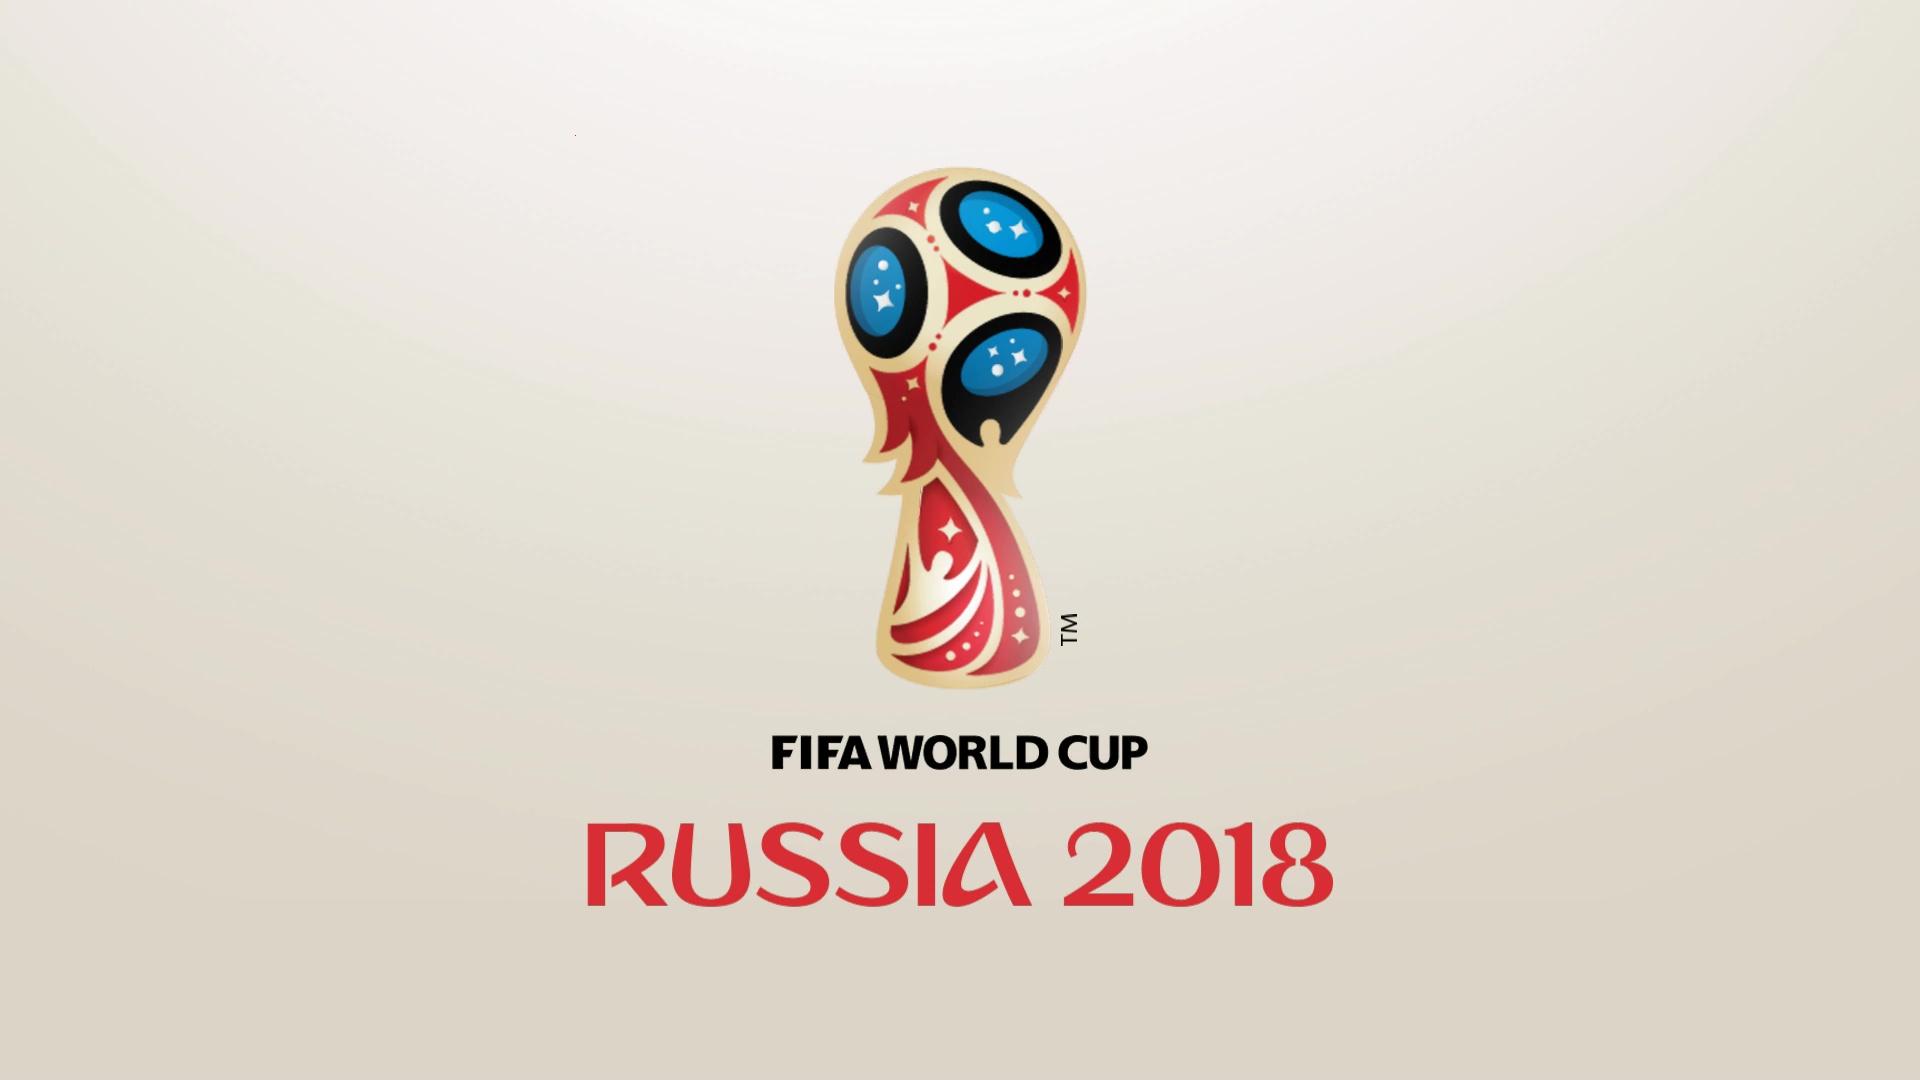 Лого Фифа 2018 ЧМ2018